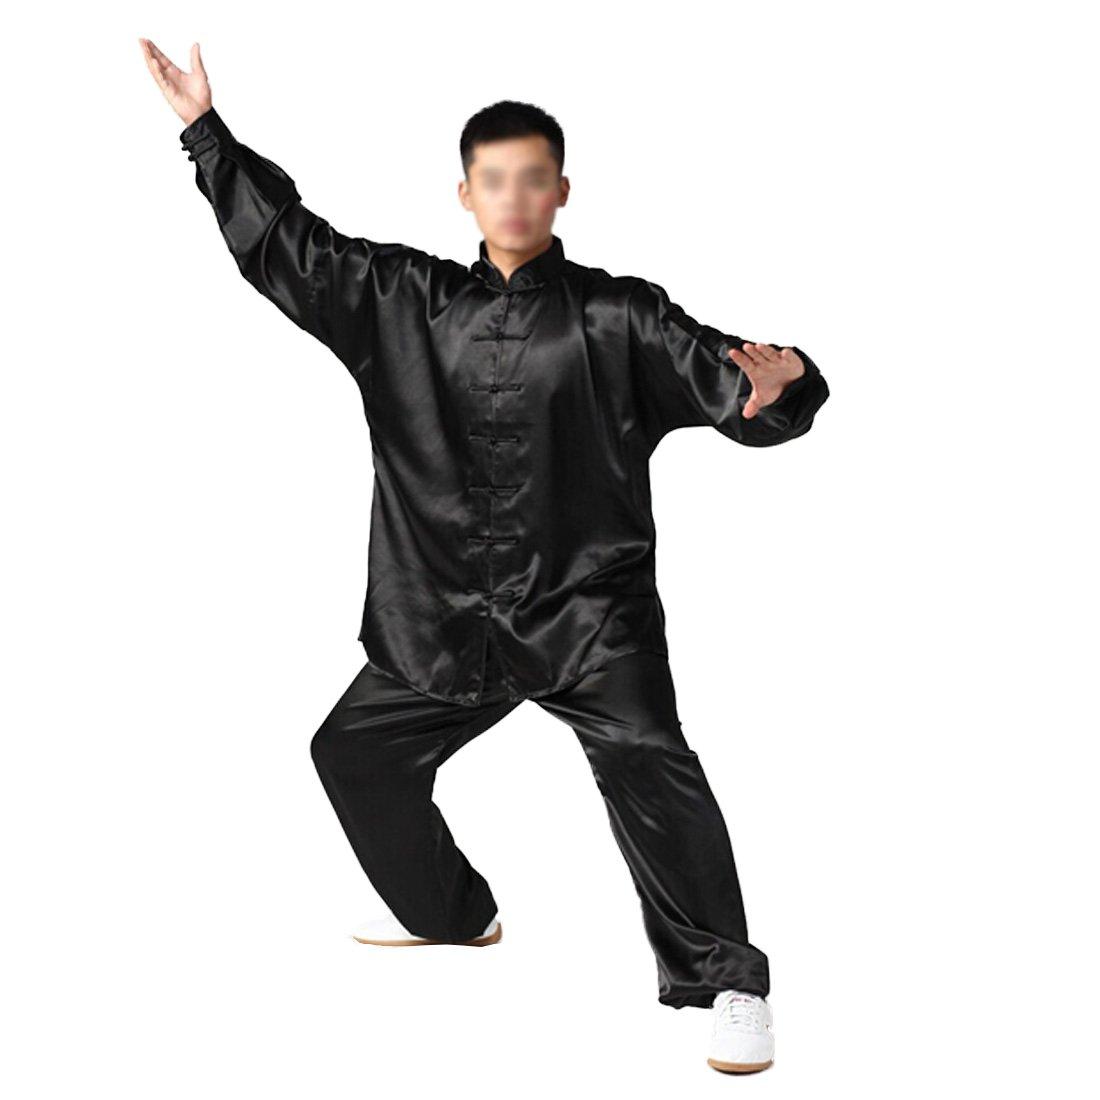 Andux Chinese Traditional Tai Chi Fu Uniforms B00QJLZ5S6 Kung Fu Clothingユニセックスss-tjf01ブラック Chinese xx-large B00QJLZ5S6, 防府市:1d7d4d60 --- capela.dominiotemporario.com